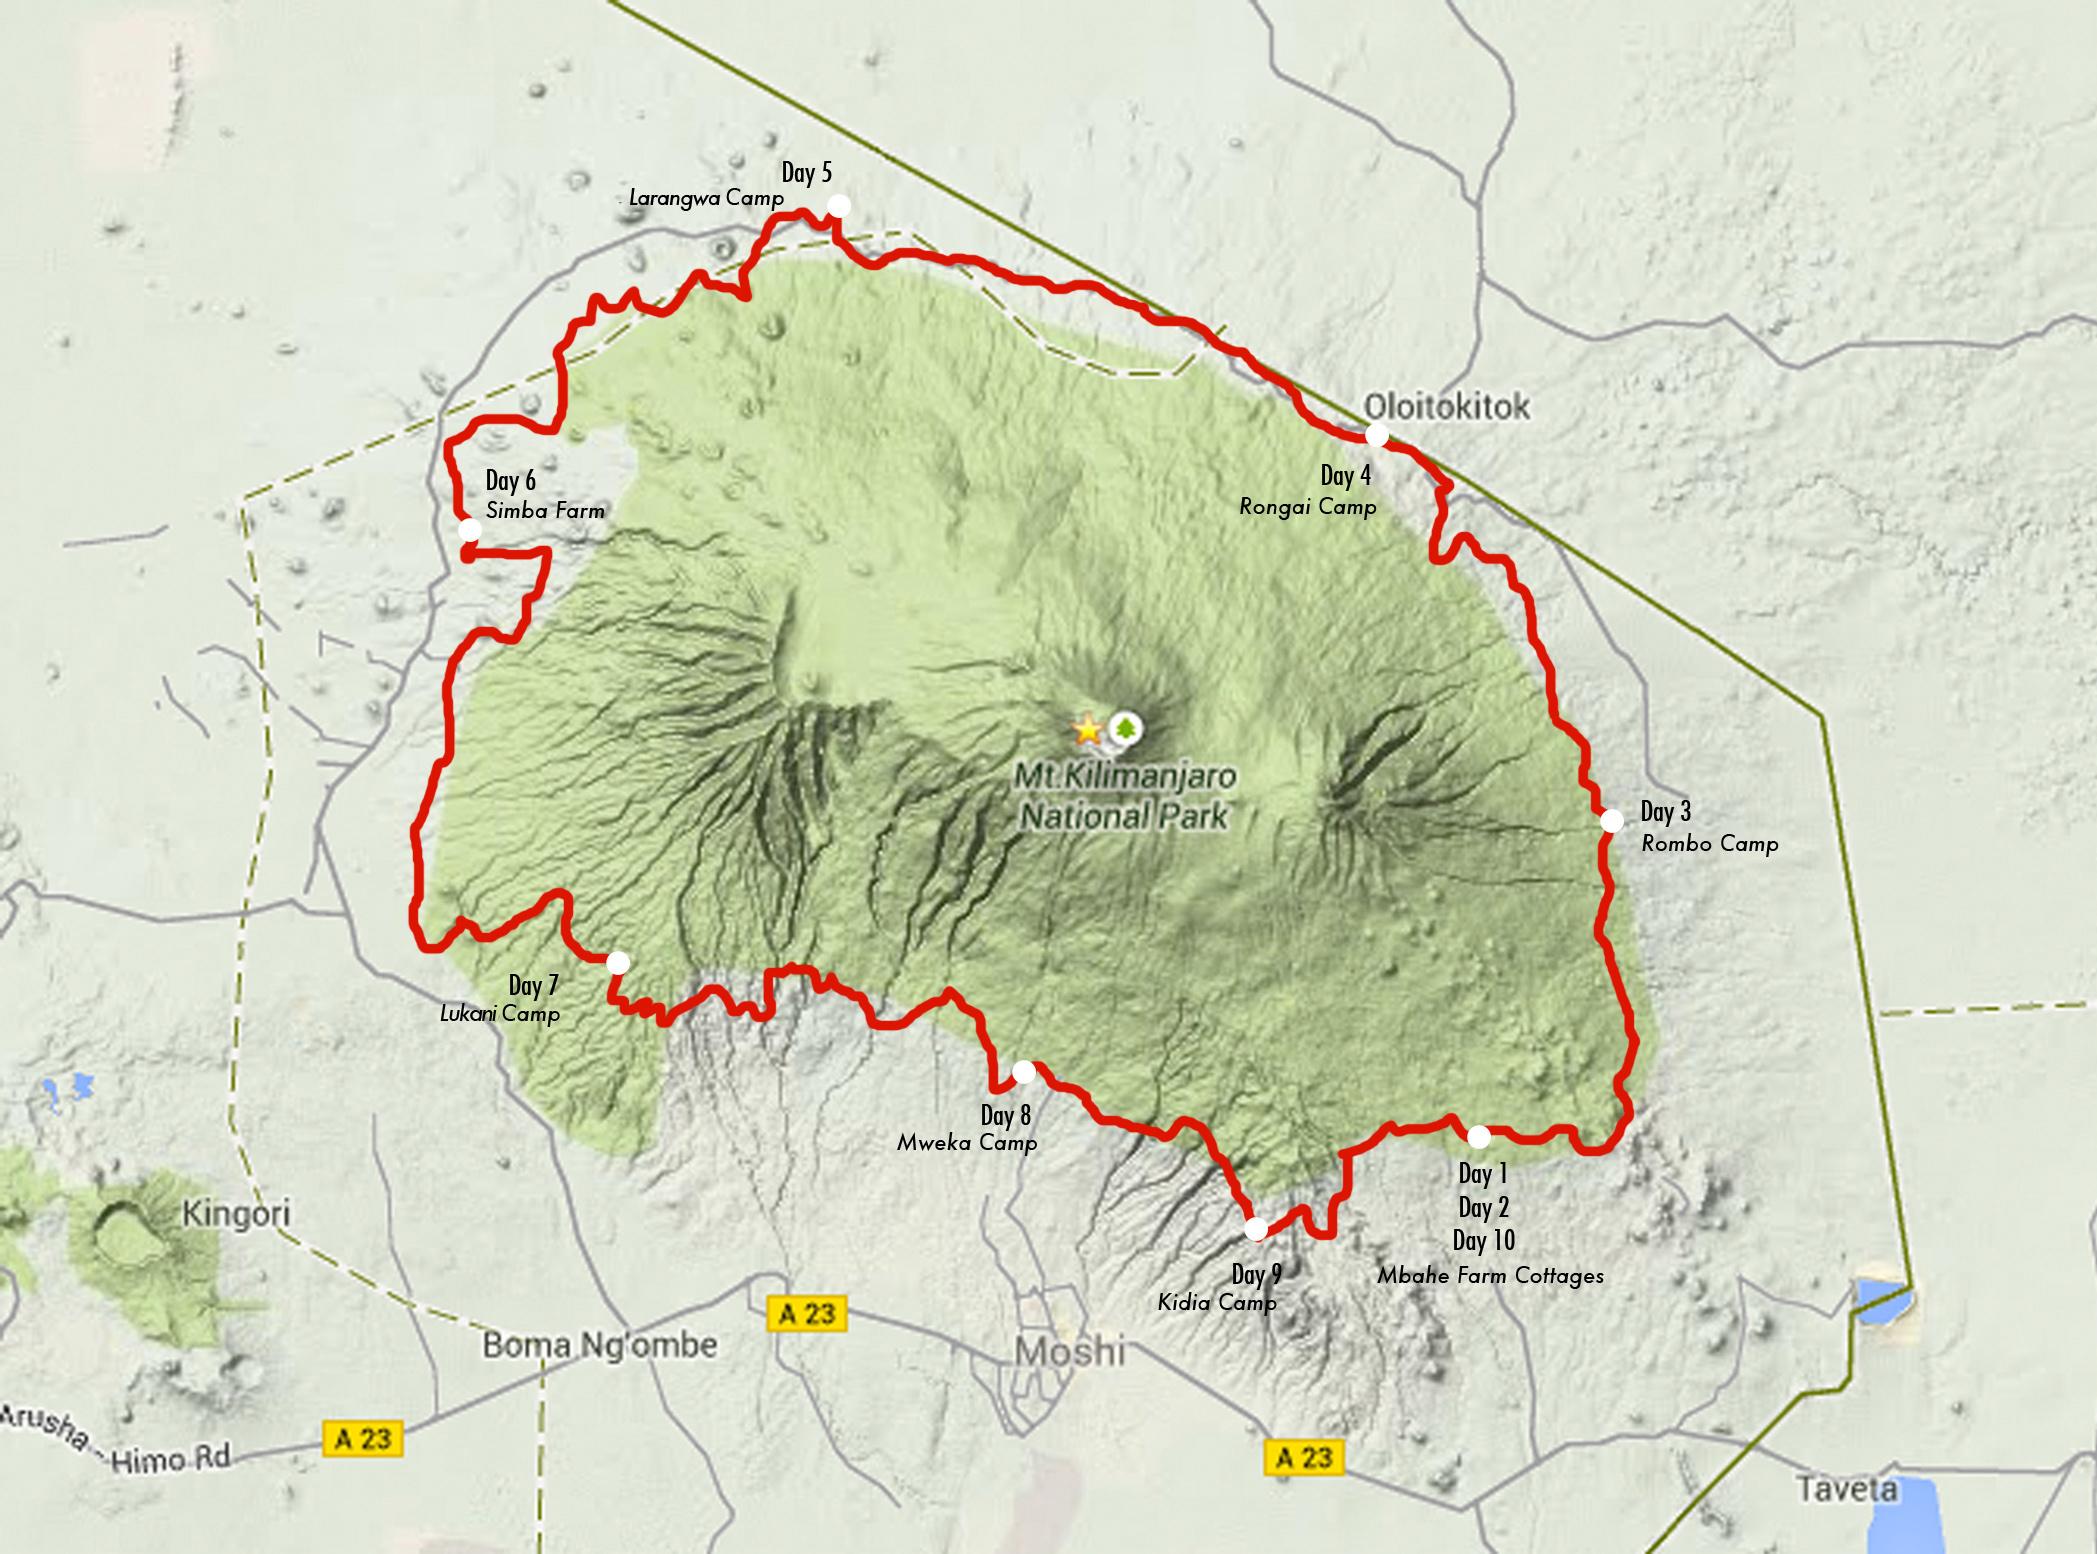 Detailed Itinerary Kilimanjaro Stage Run